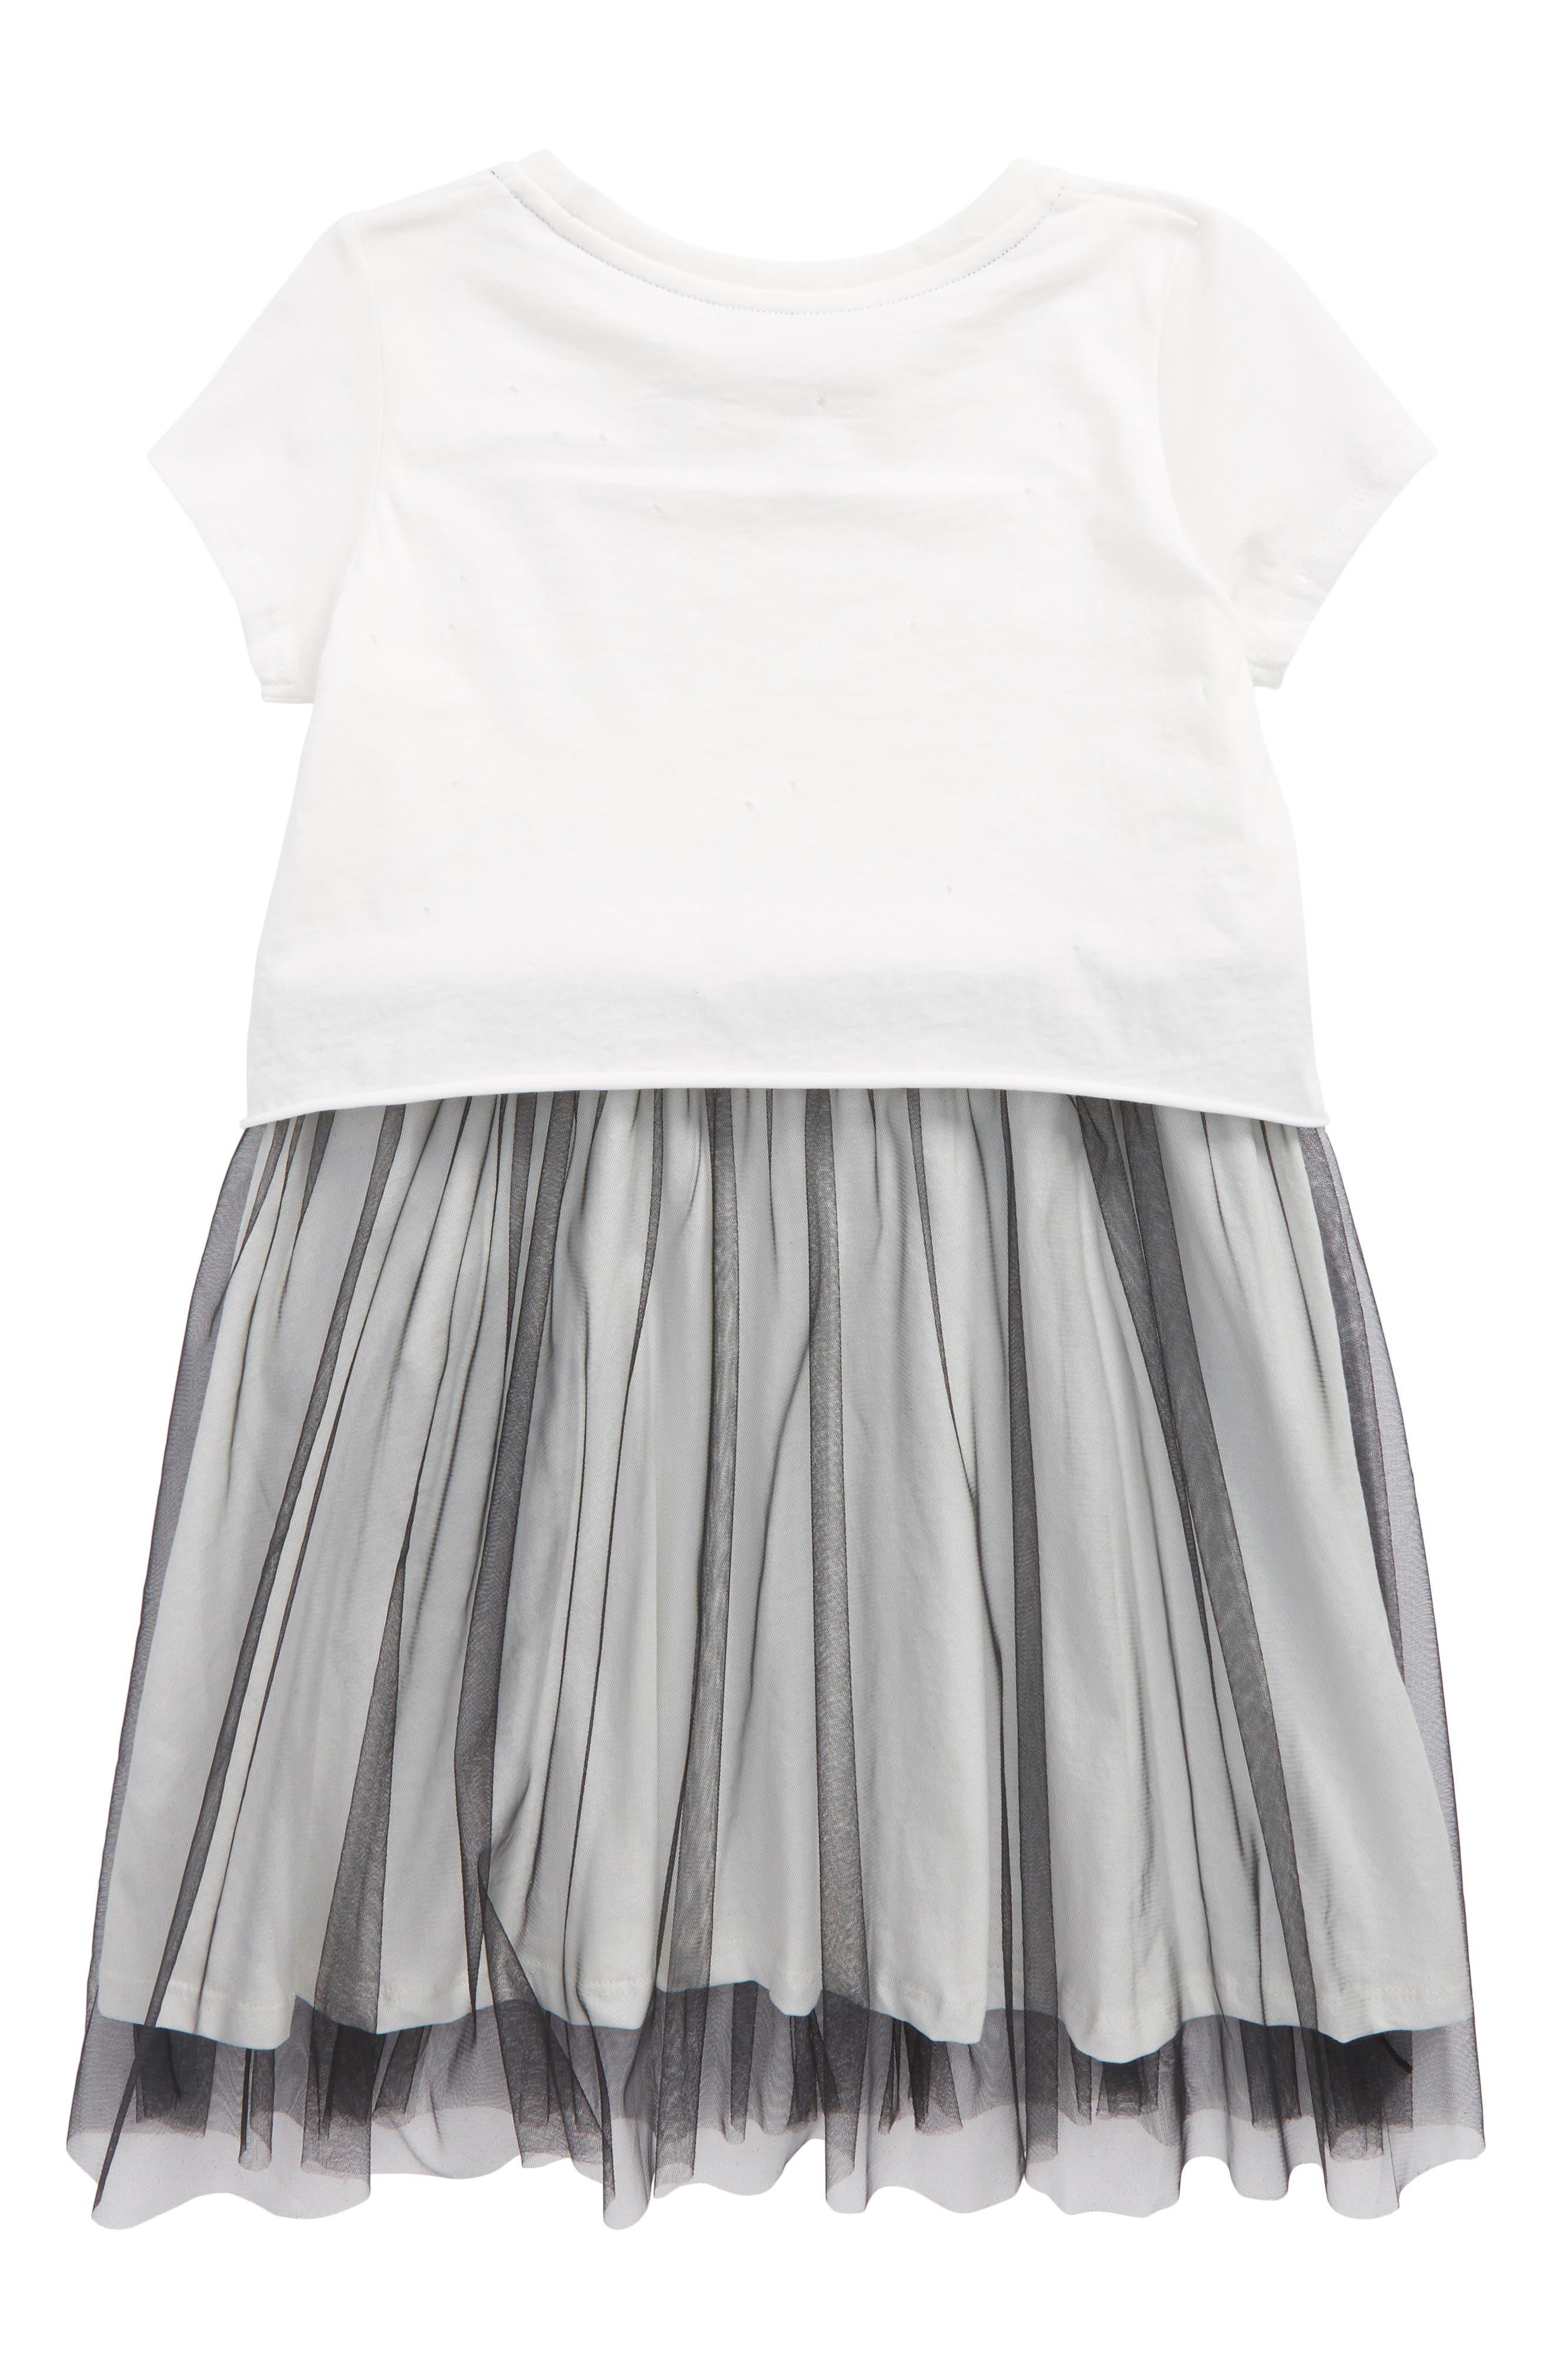 Unicorn Tutu Dress,                             Alternate thumbnail 2, color,                             Cream And Black